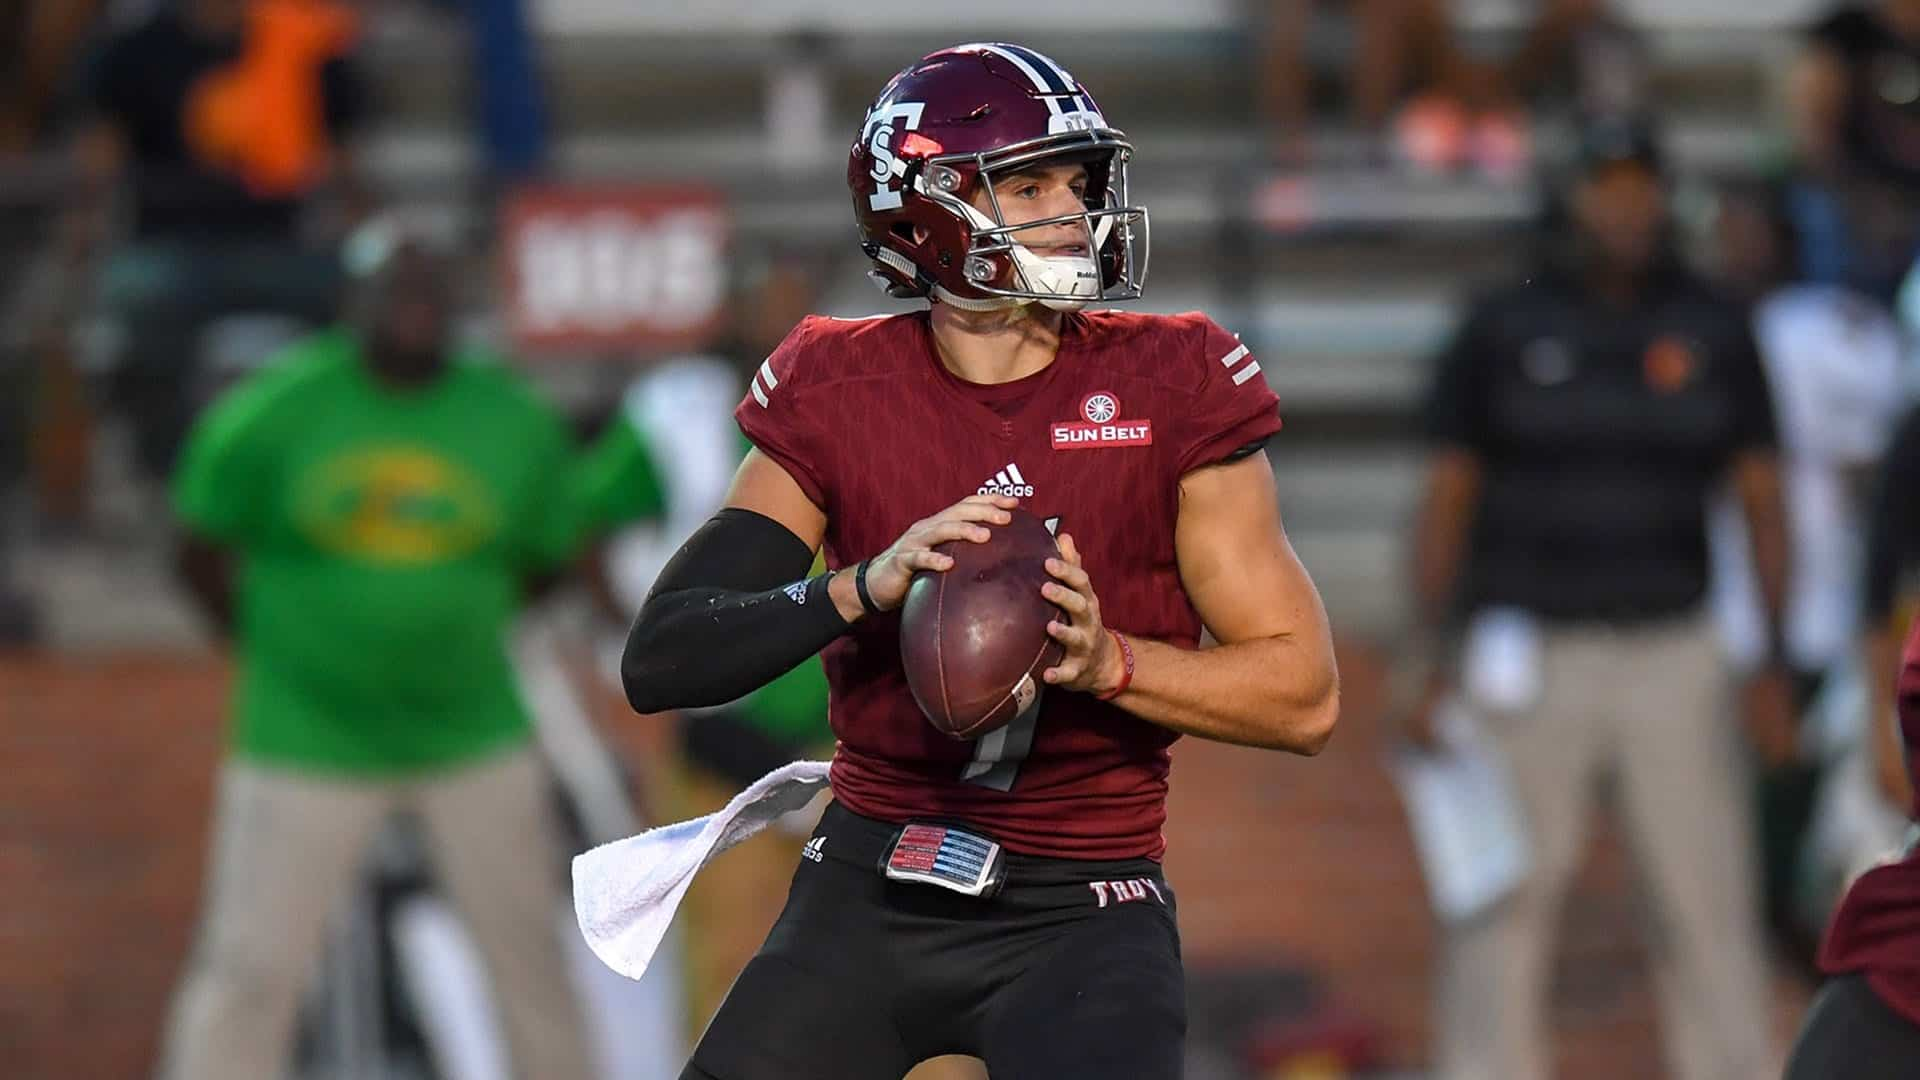 Troy QB Kaleb Barker a sleeper prospect in 2020 NFL Draft